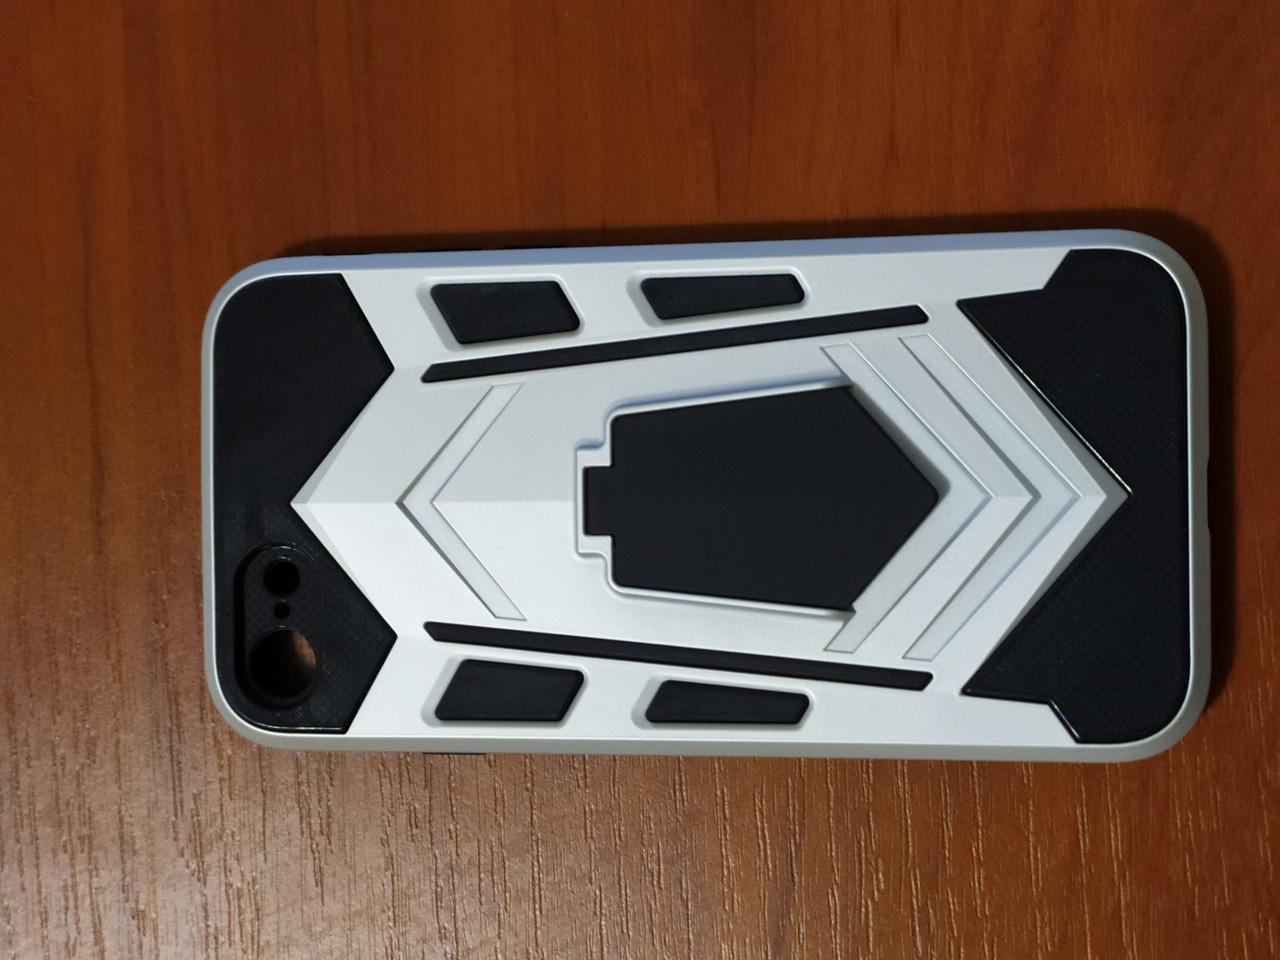 Накладка  Armor Case  iPhone 7 / 8 / SE 2020  с подставкой  (серебро)